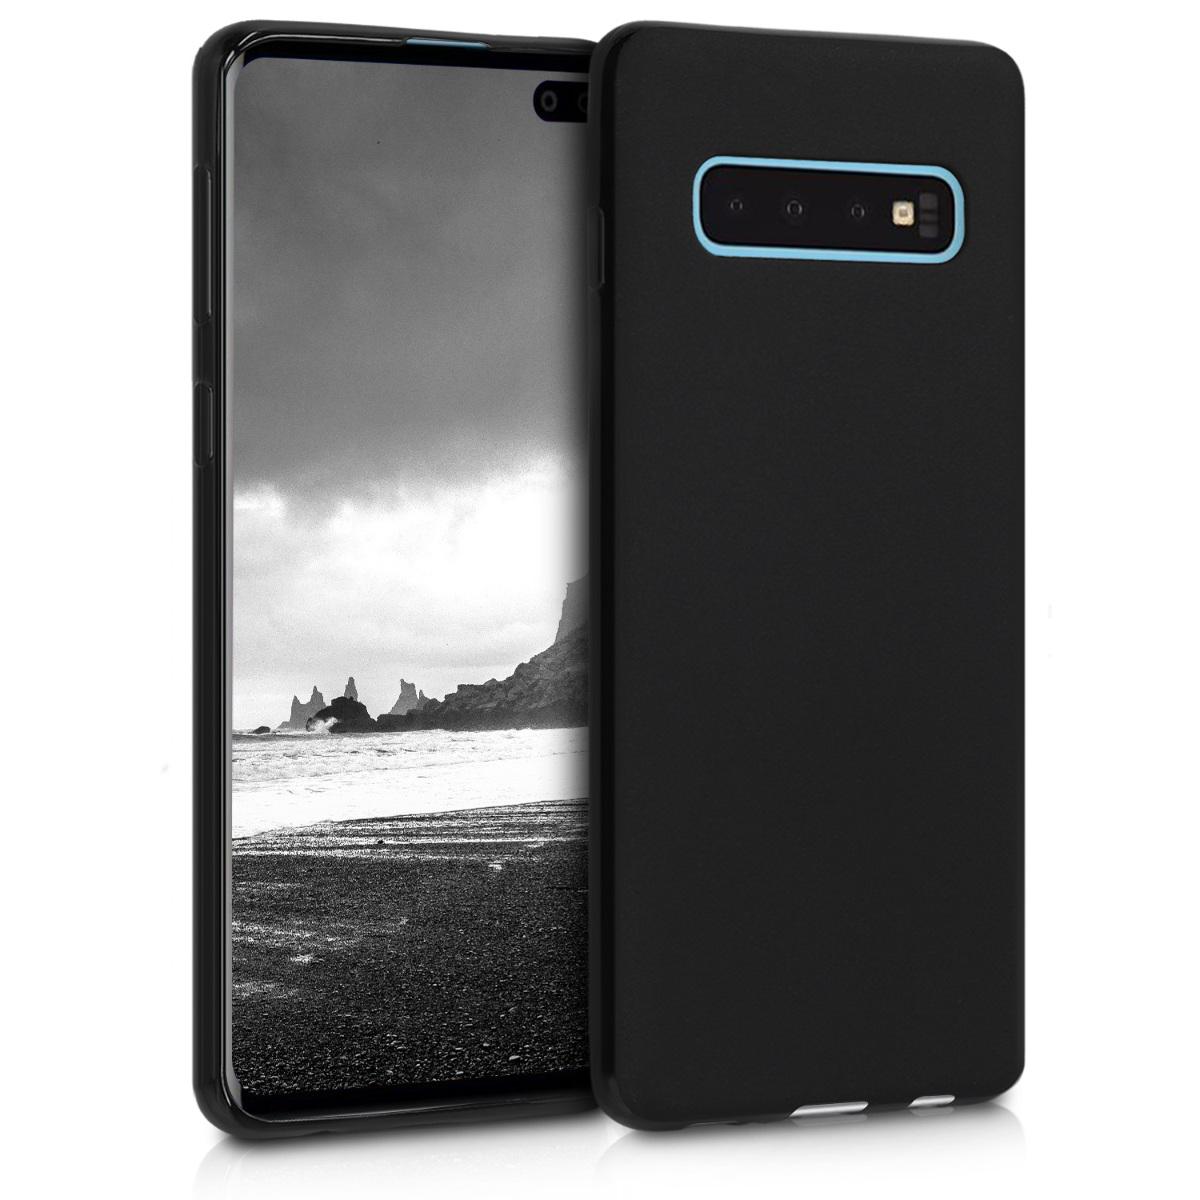 KW Θήκη Σιλικόνης Samsung Galaxy S10 - Black Matte (47447.47)